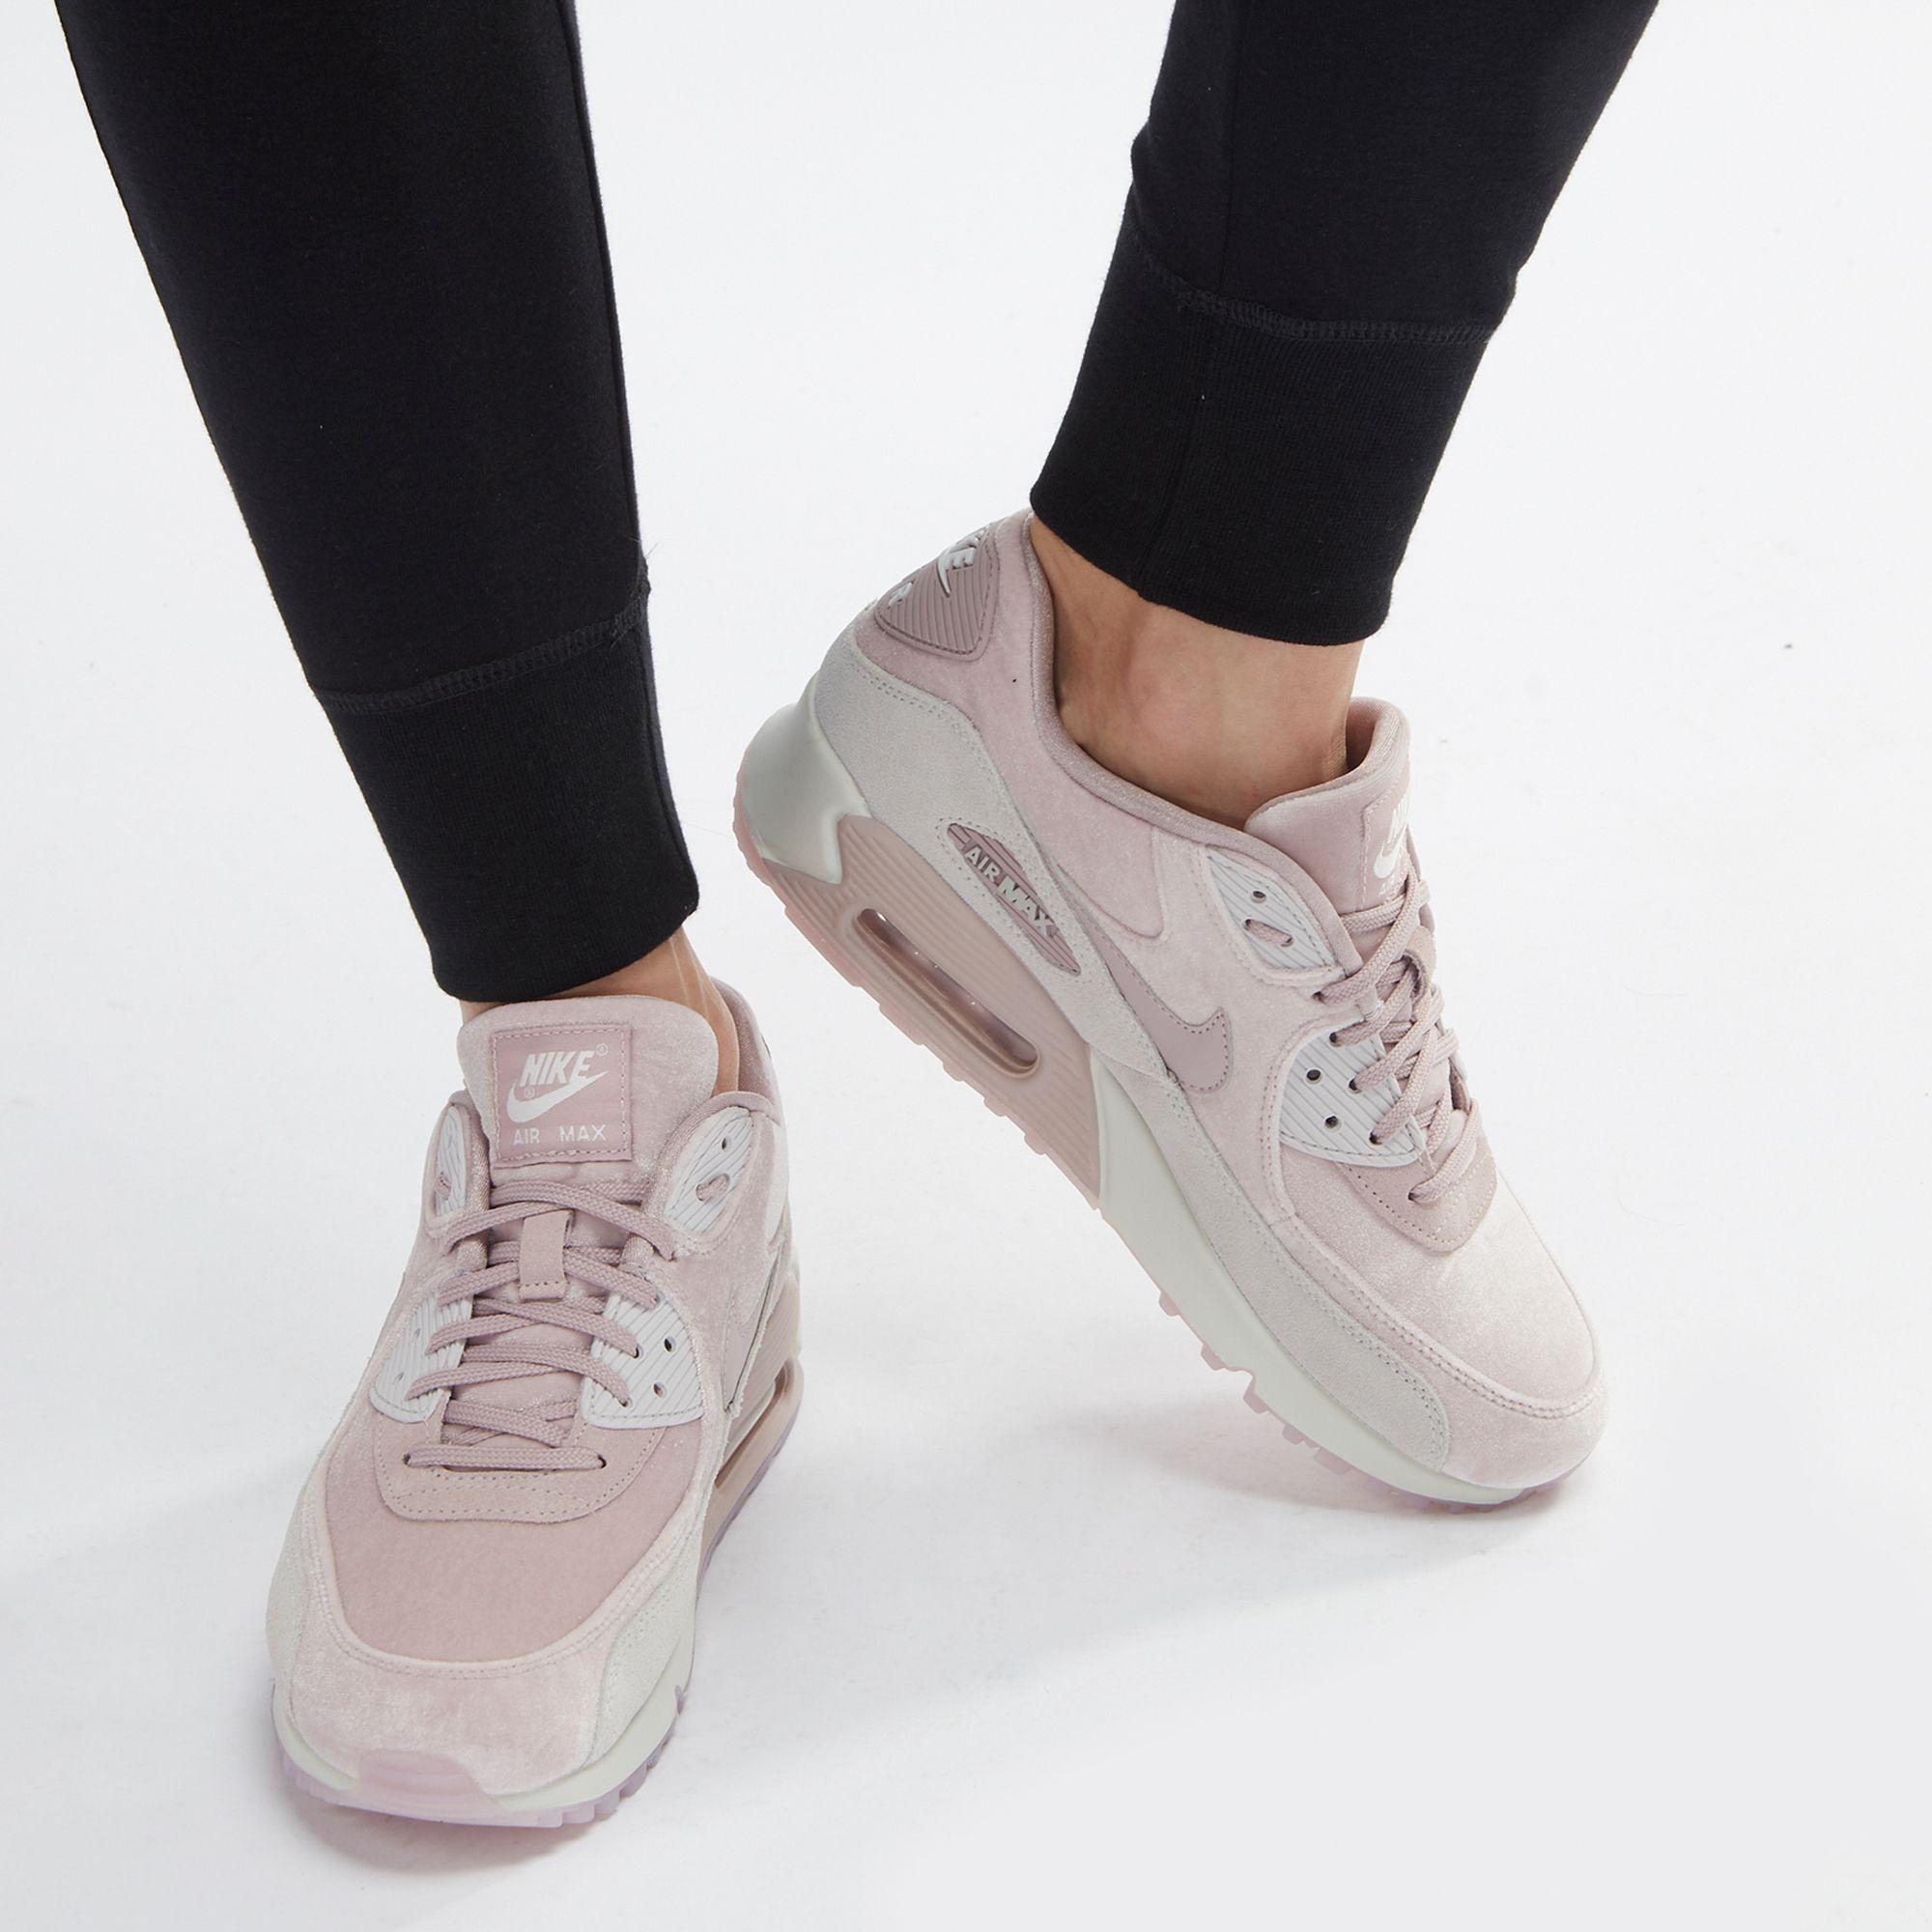 outlet store 37ea0 7c0eb Nike Air Max 90 LX Velvet Shoe | Sneakers | Shoes | Women's ...